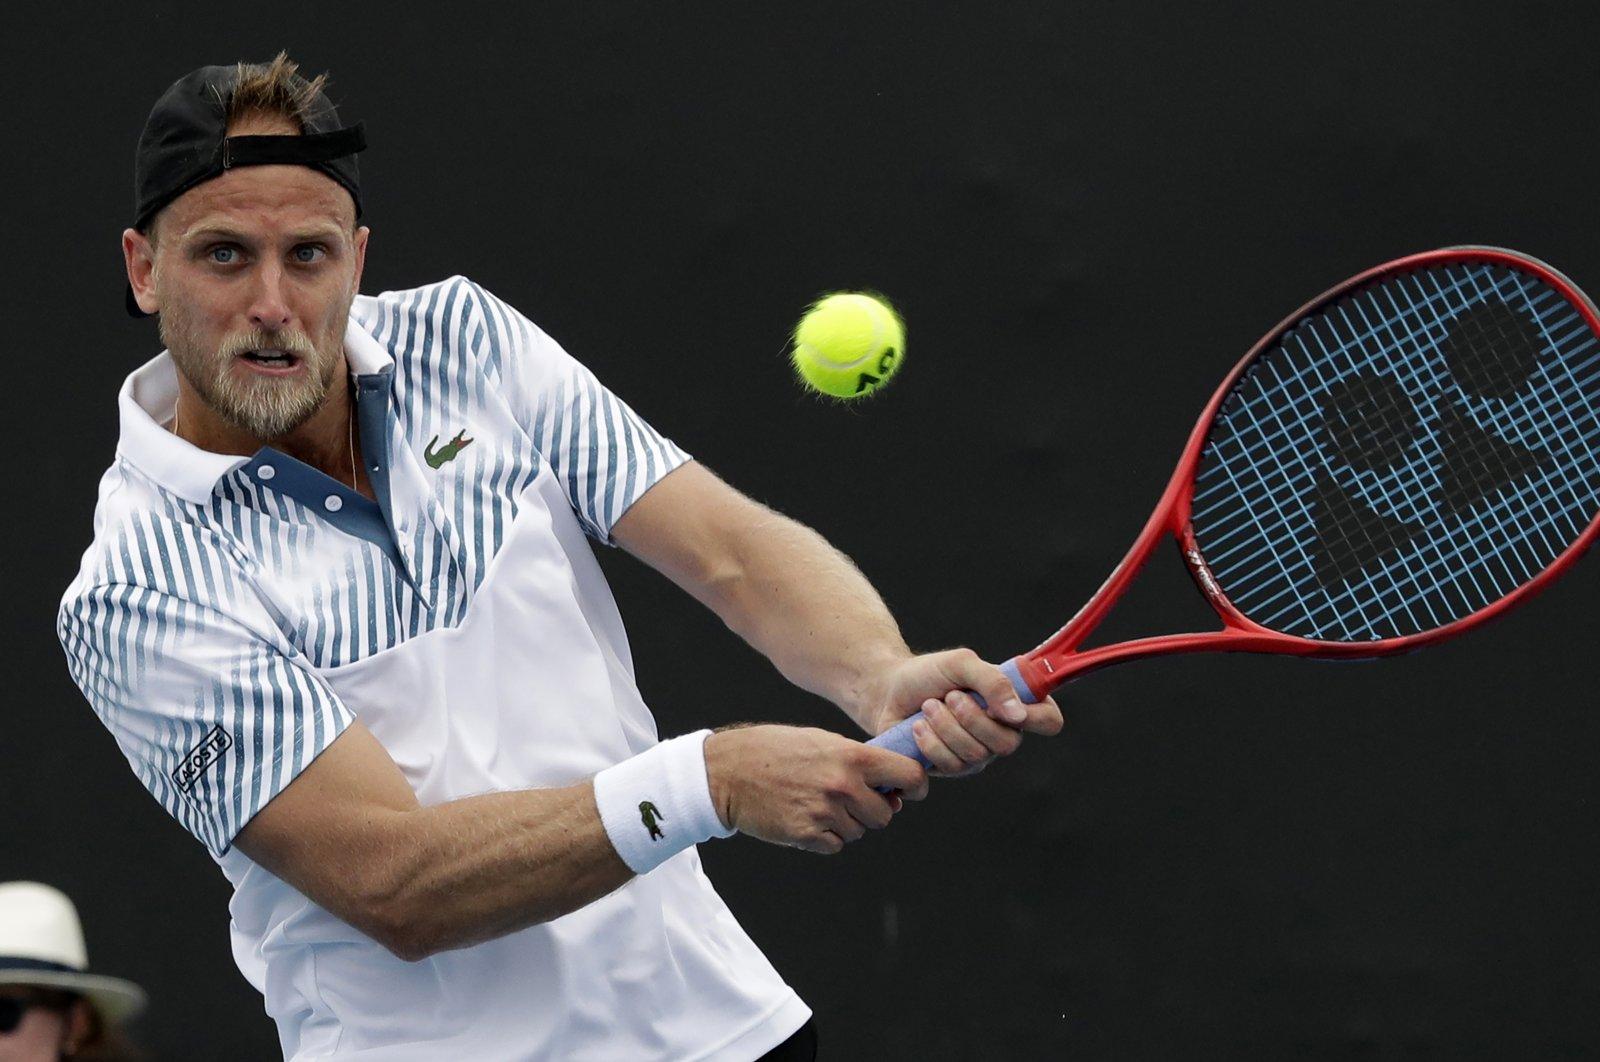 Denis Kudla plays a shot to Diego Schwartzman during an Australian Open tennis match, in Melbourne, Australia, Jan. 16, 2019. (AP Photo)